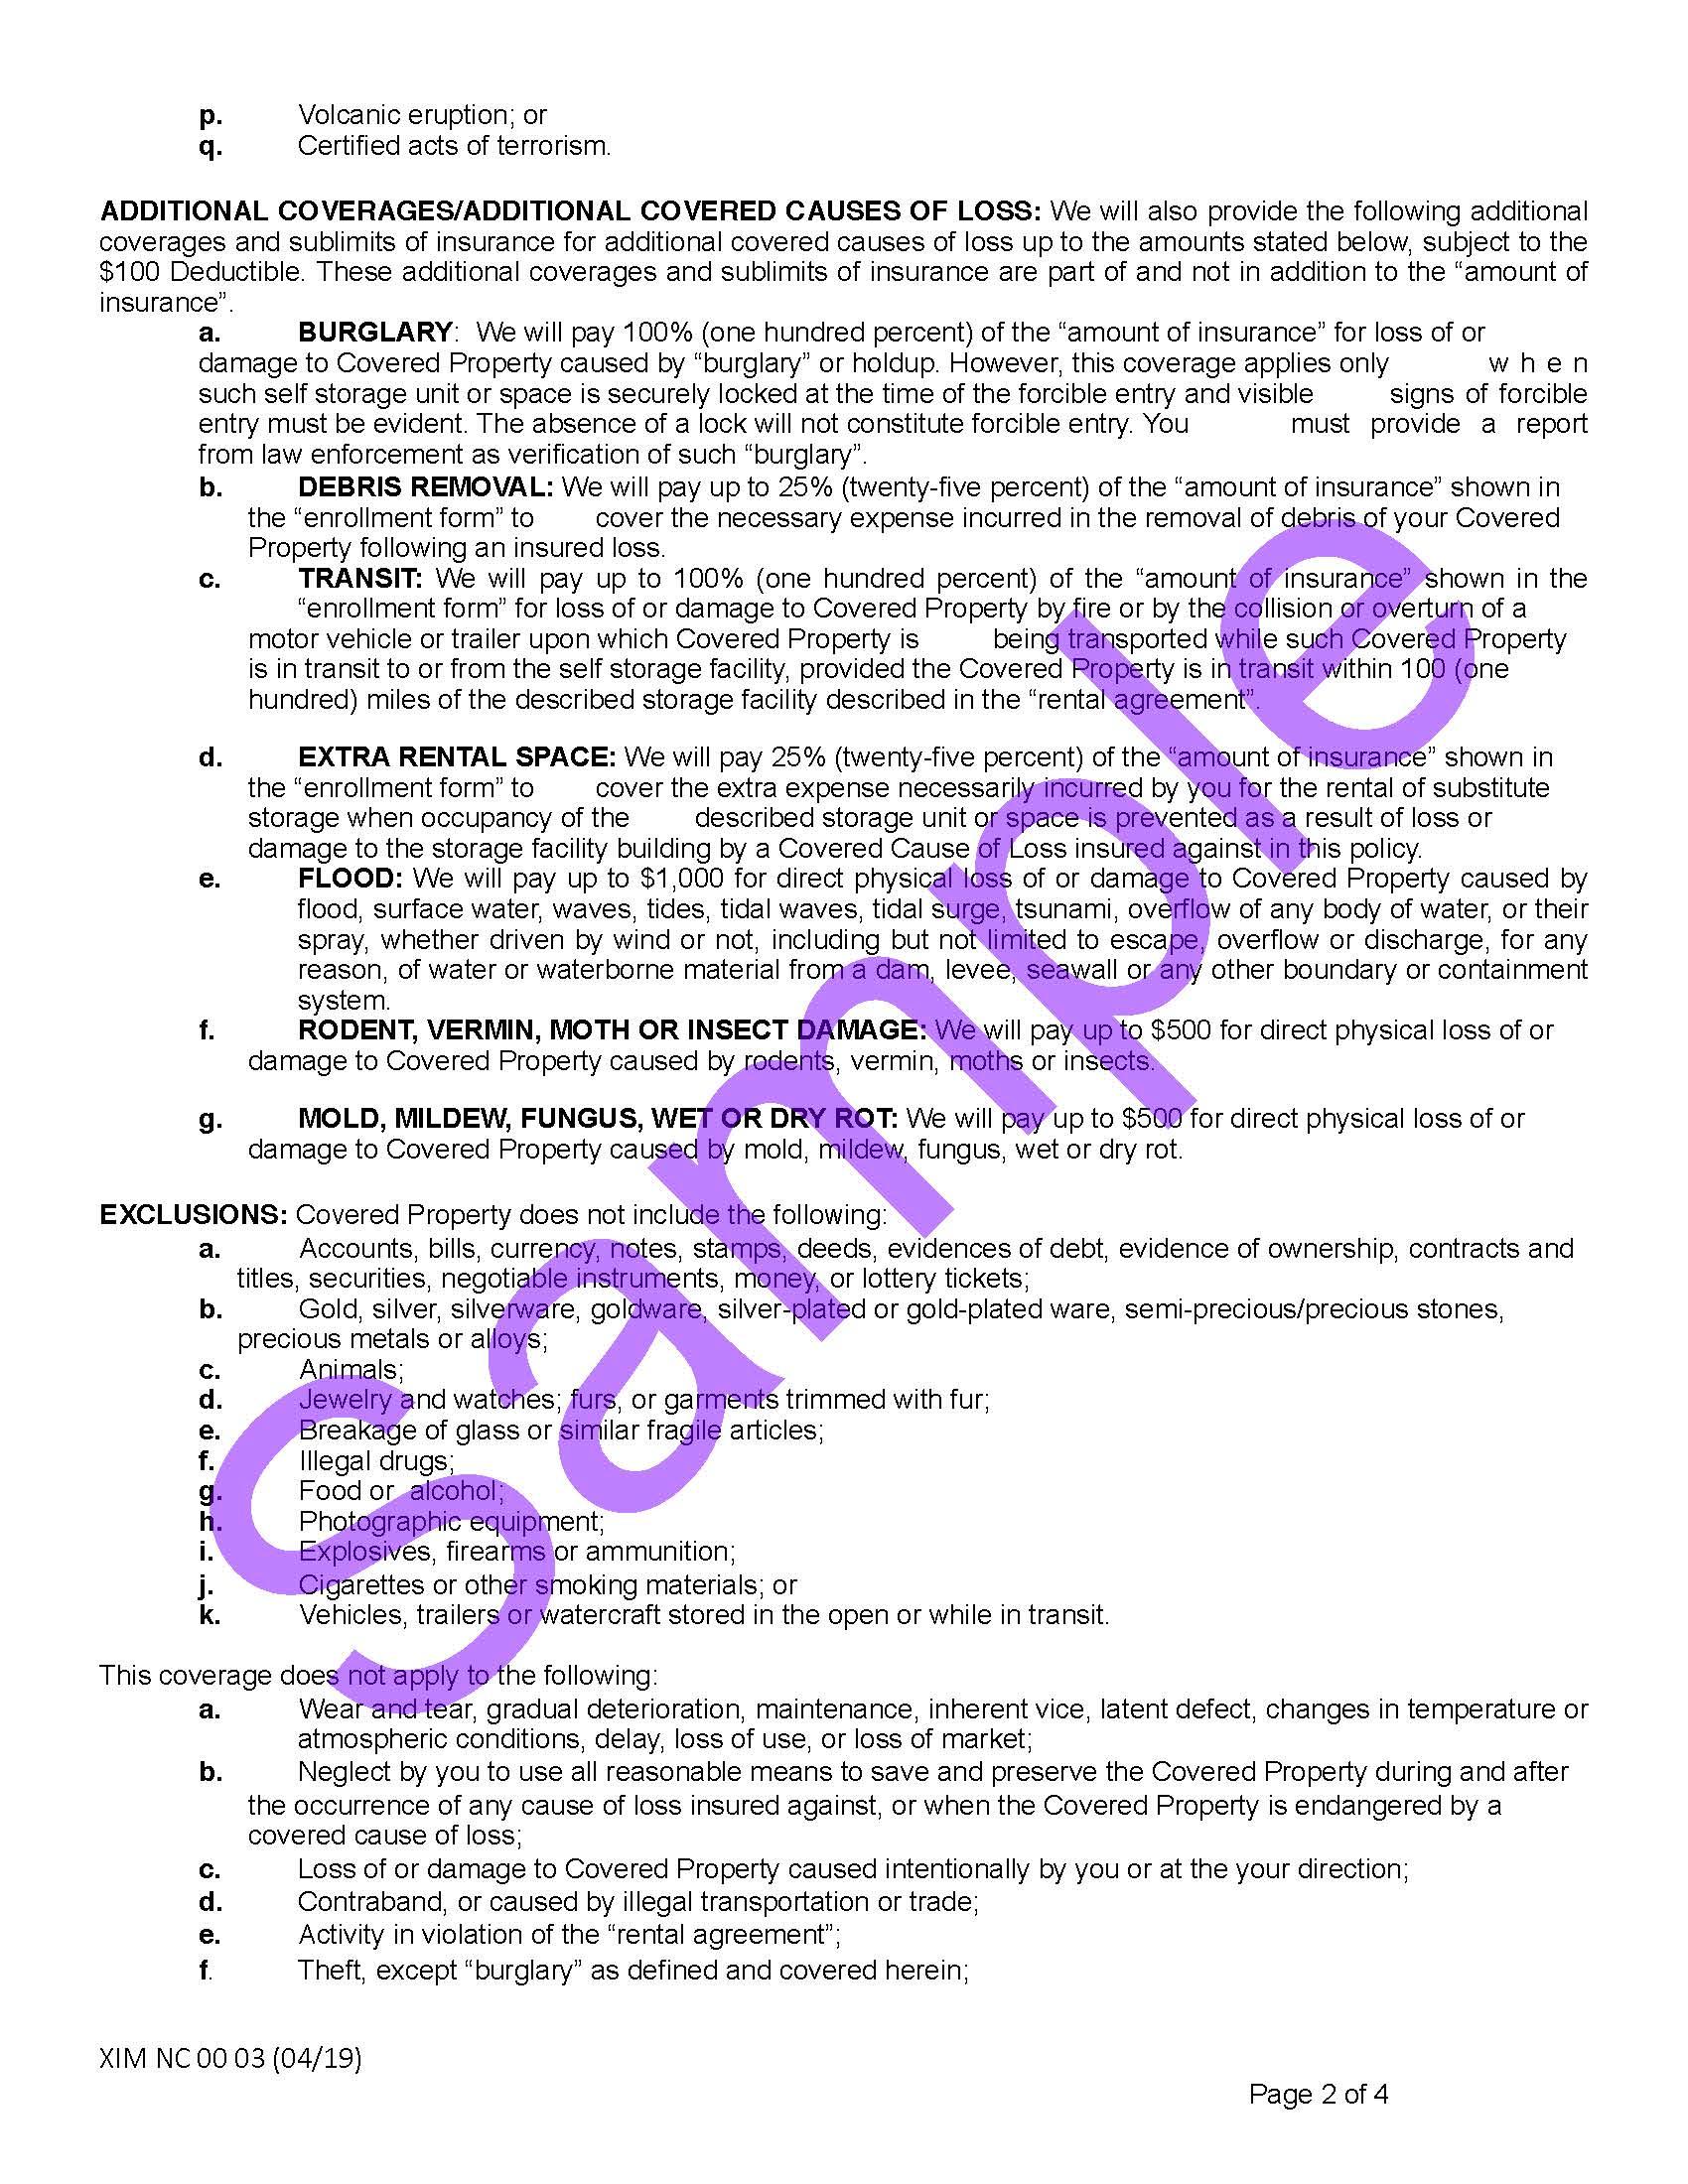 XIM NC 00 03 04 19 North Carolina Certificate of InsuranceSample_Page_2.jpg